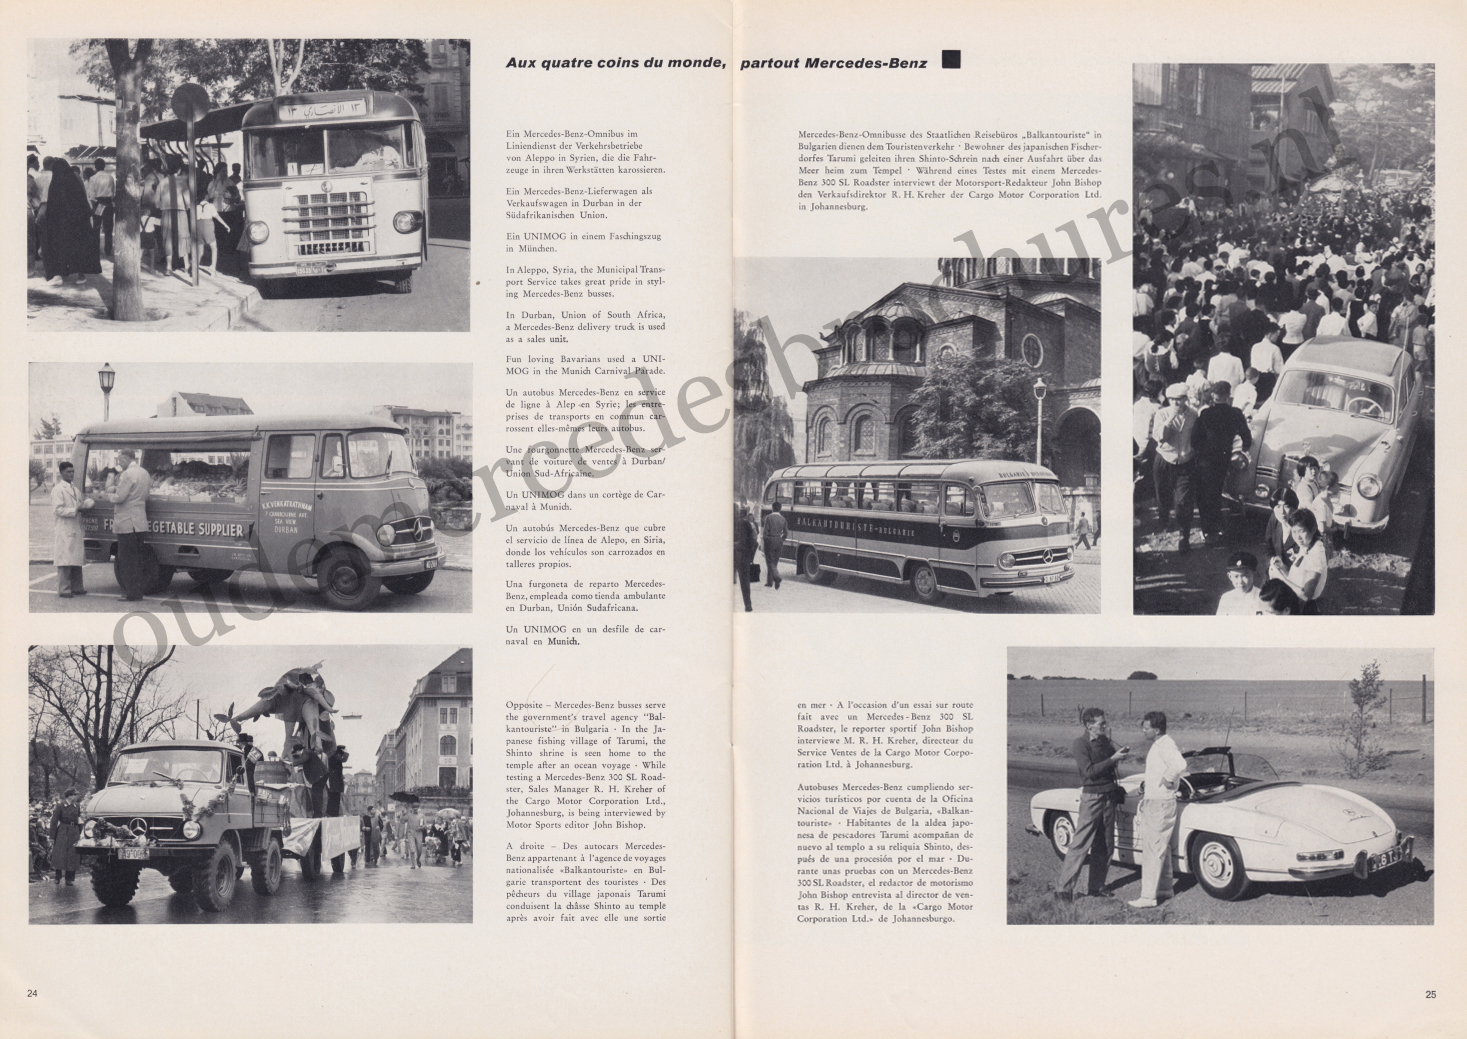 (REVISTA): Periódico In aller welt n.º 30 - Mercedes-Benz no mundo - 1959 - multilingue 013